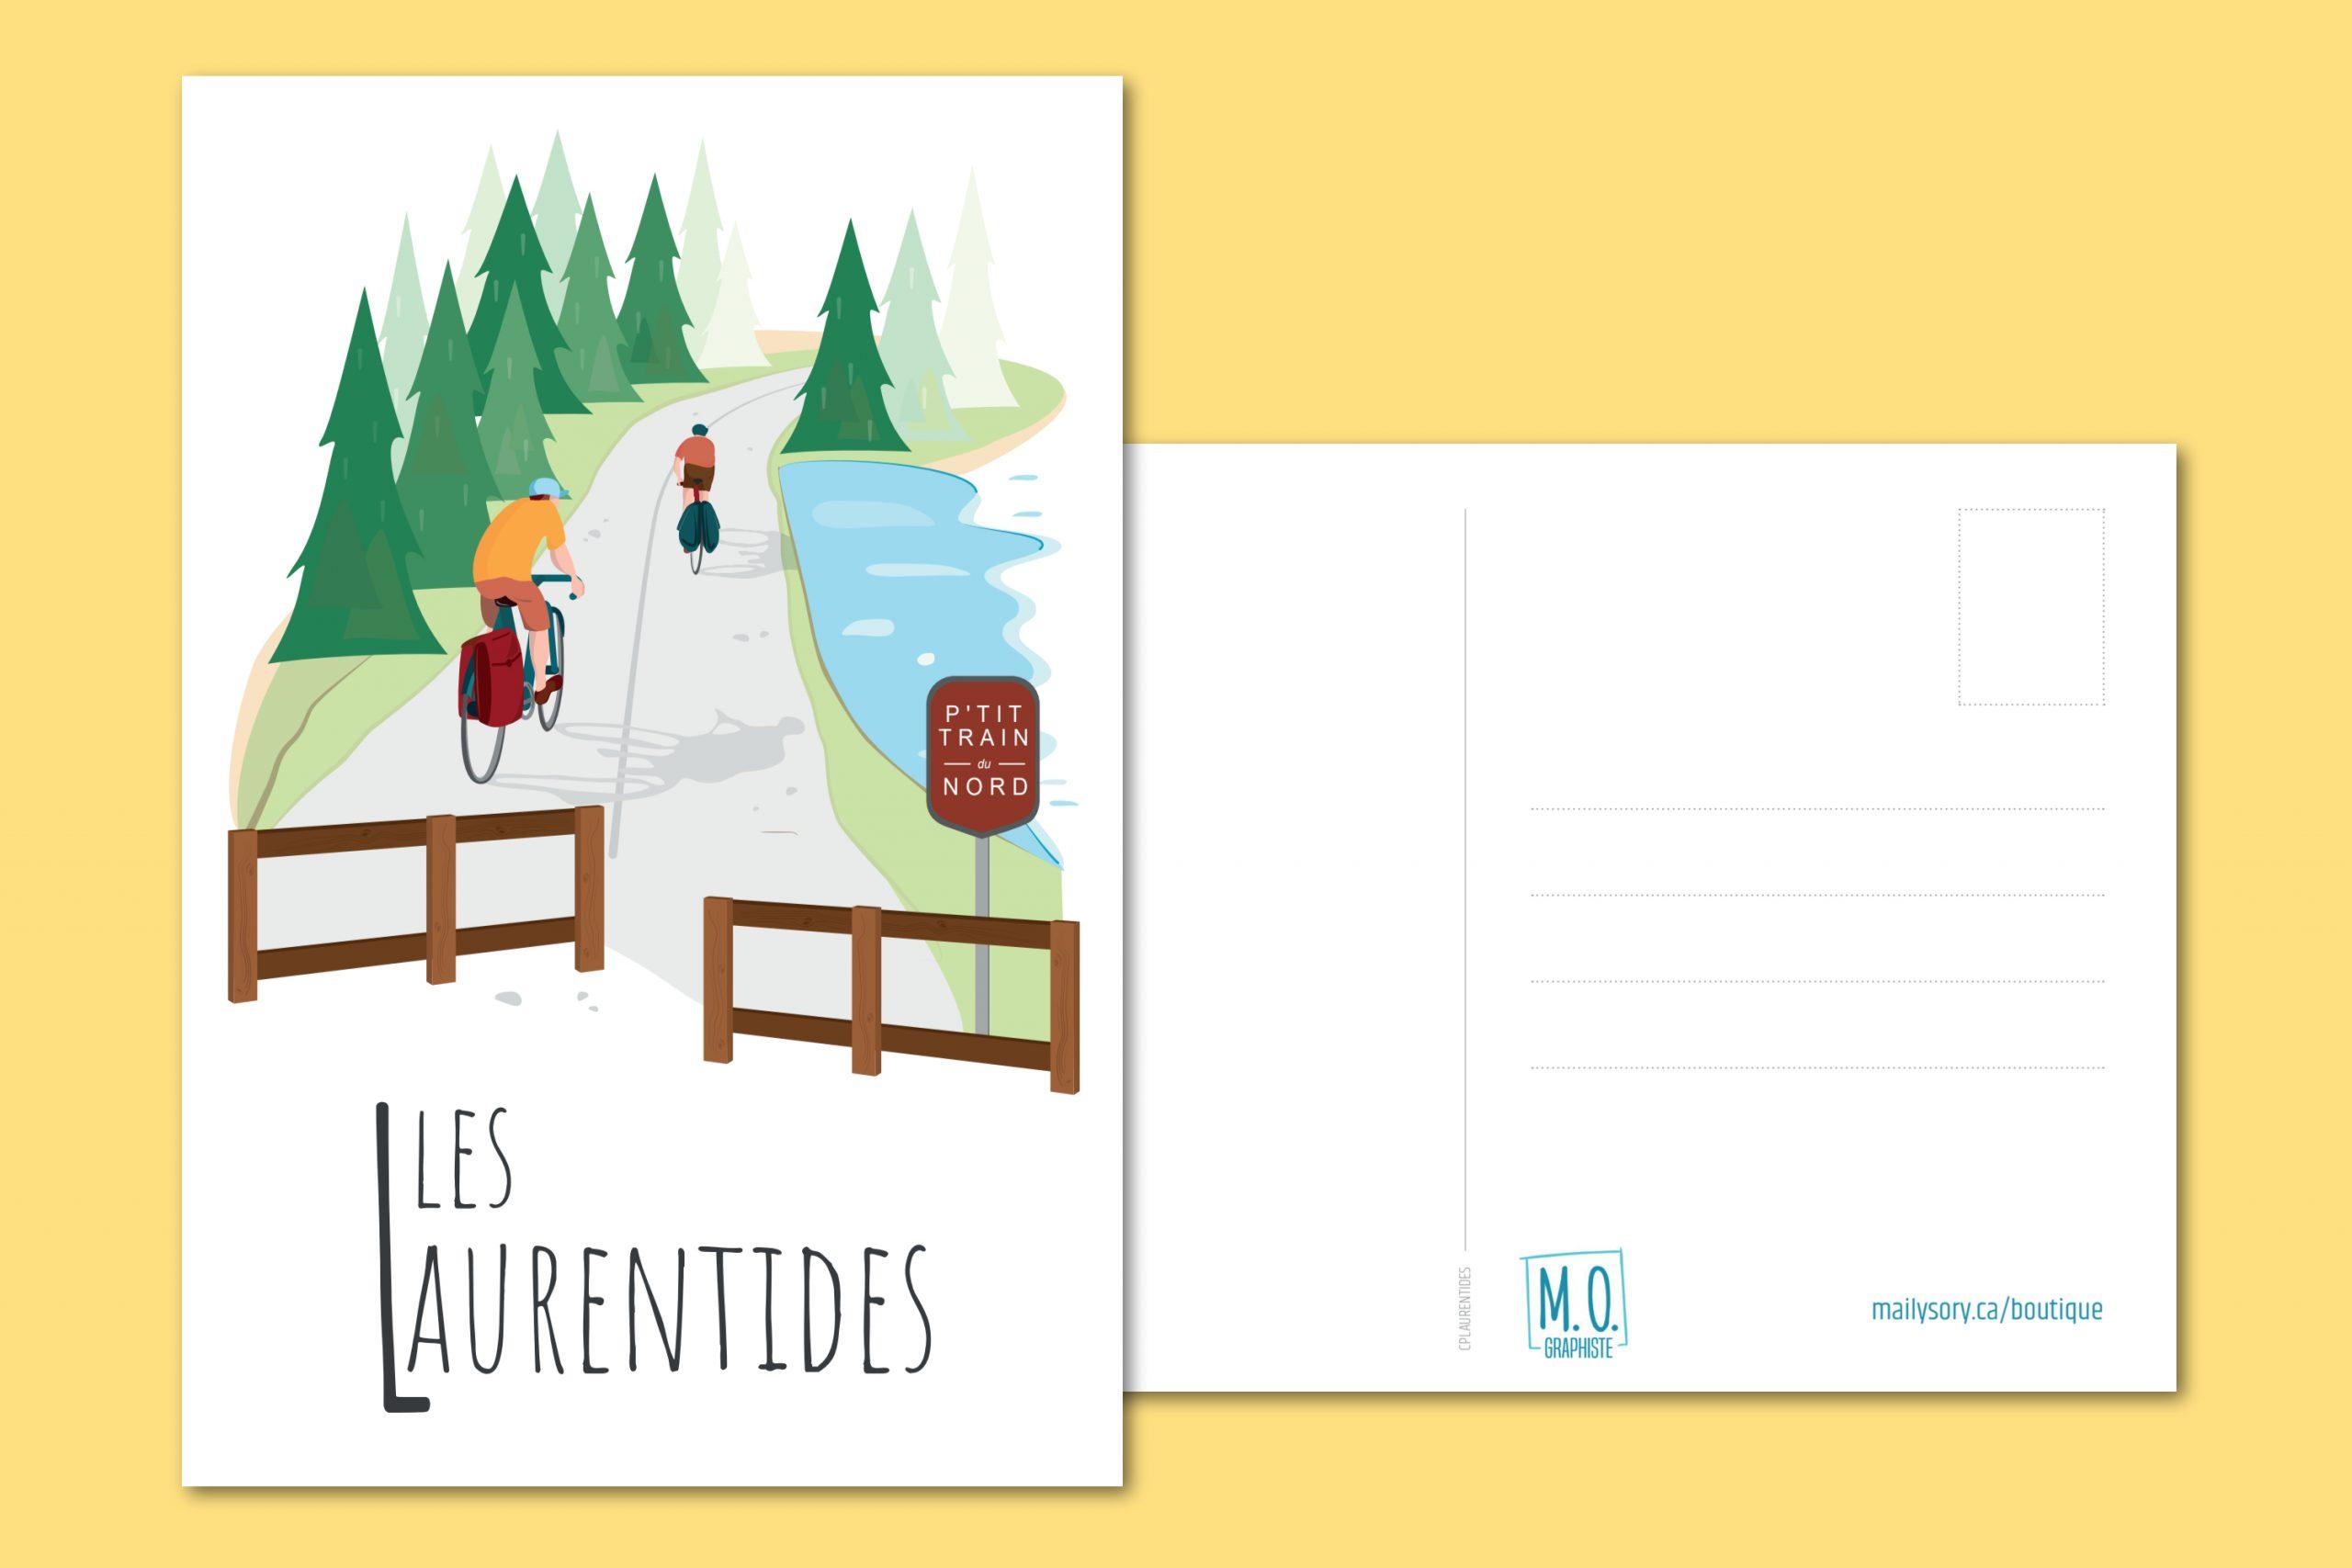 Mailys ORY - Graphiste | Illustration - Les Laurentides